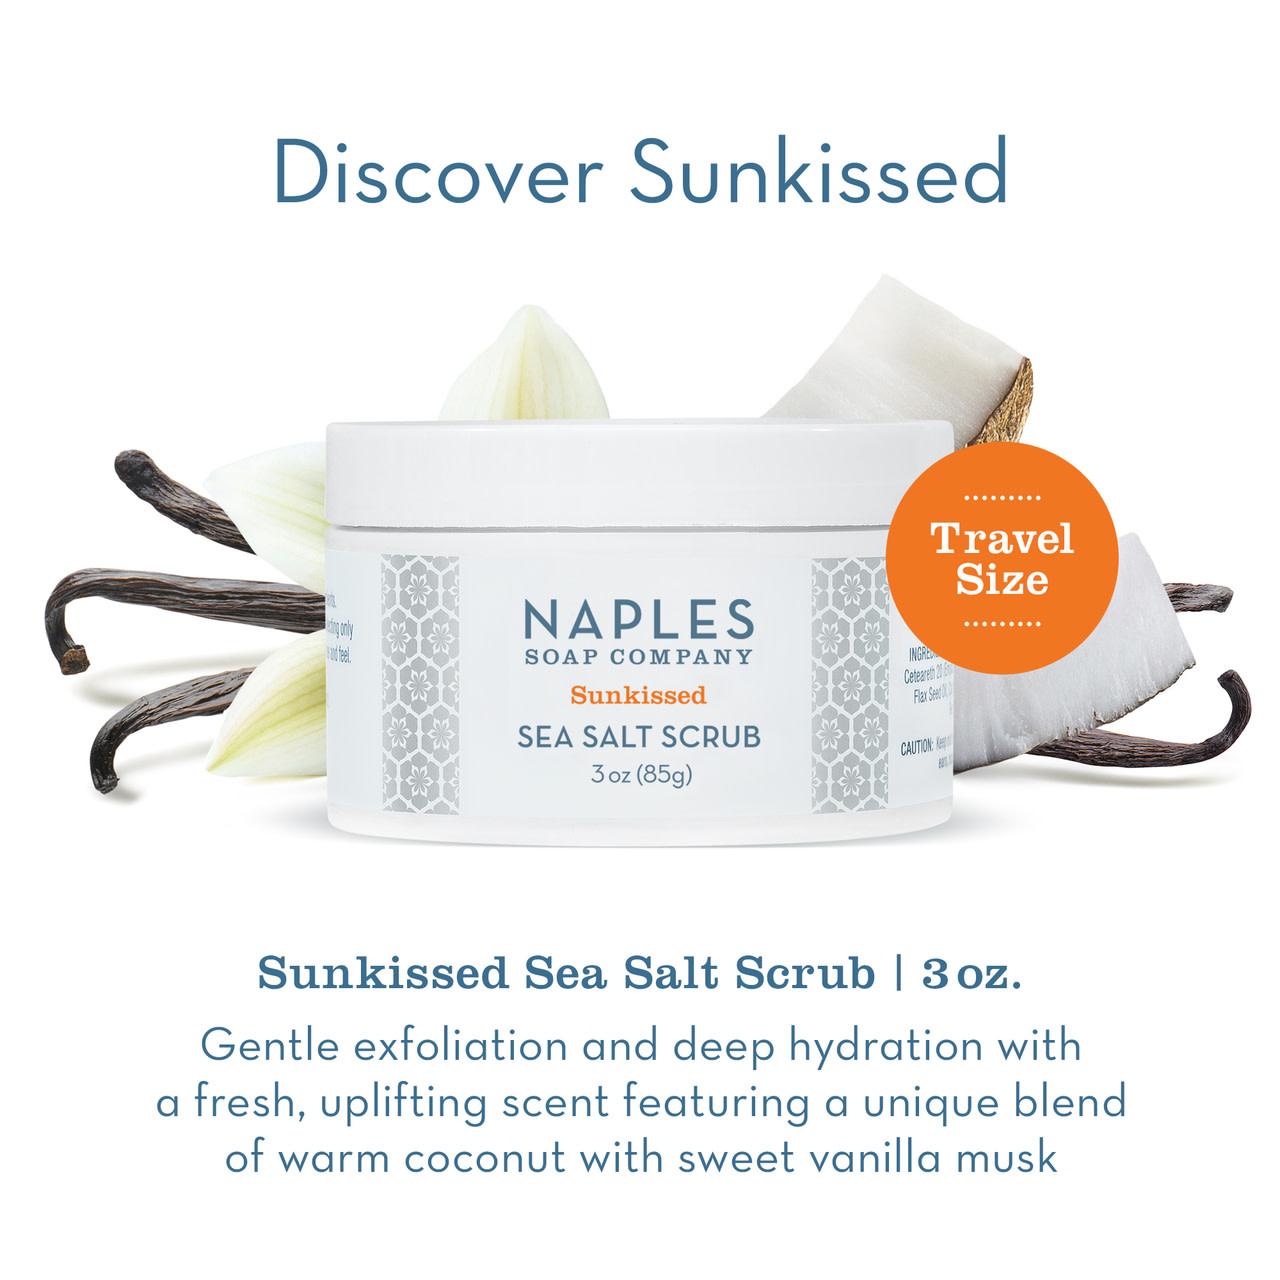 Naples Soap Co. Sunkissed Sea Salt Scrub 3 oz